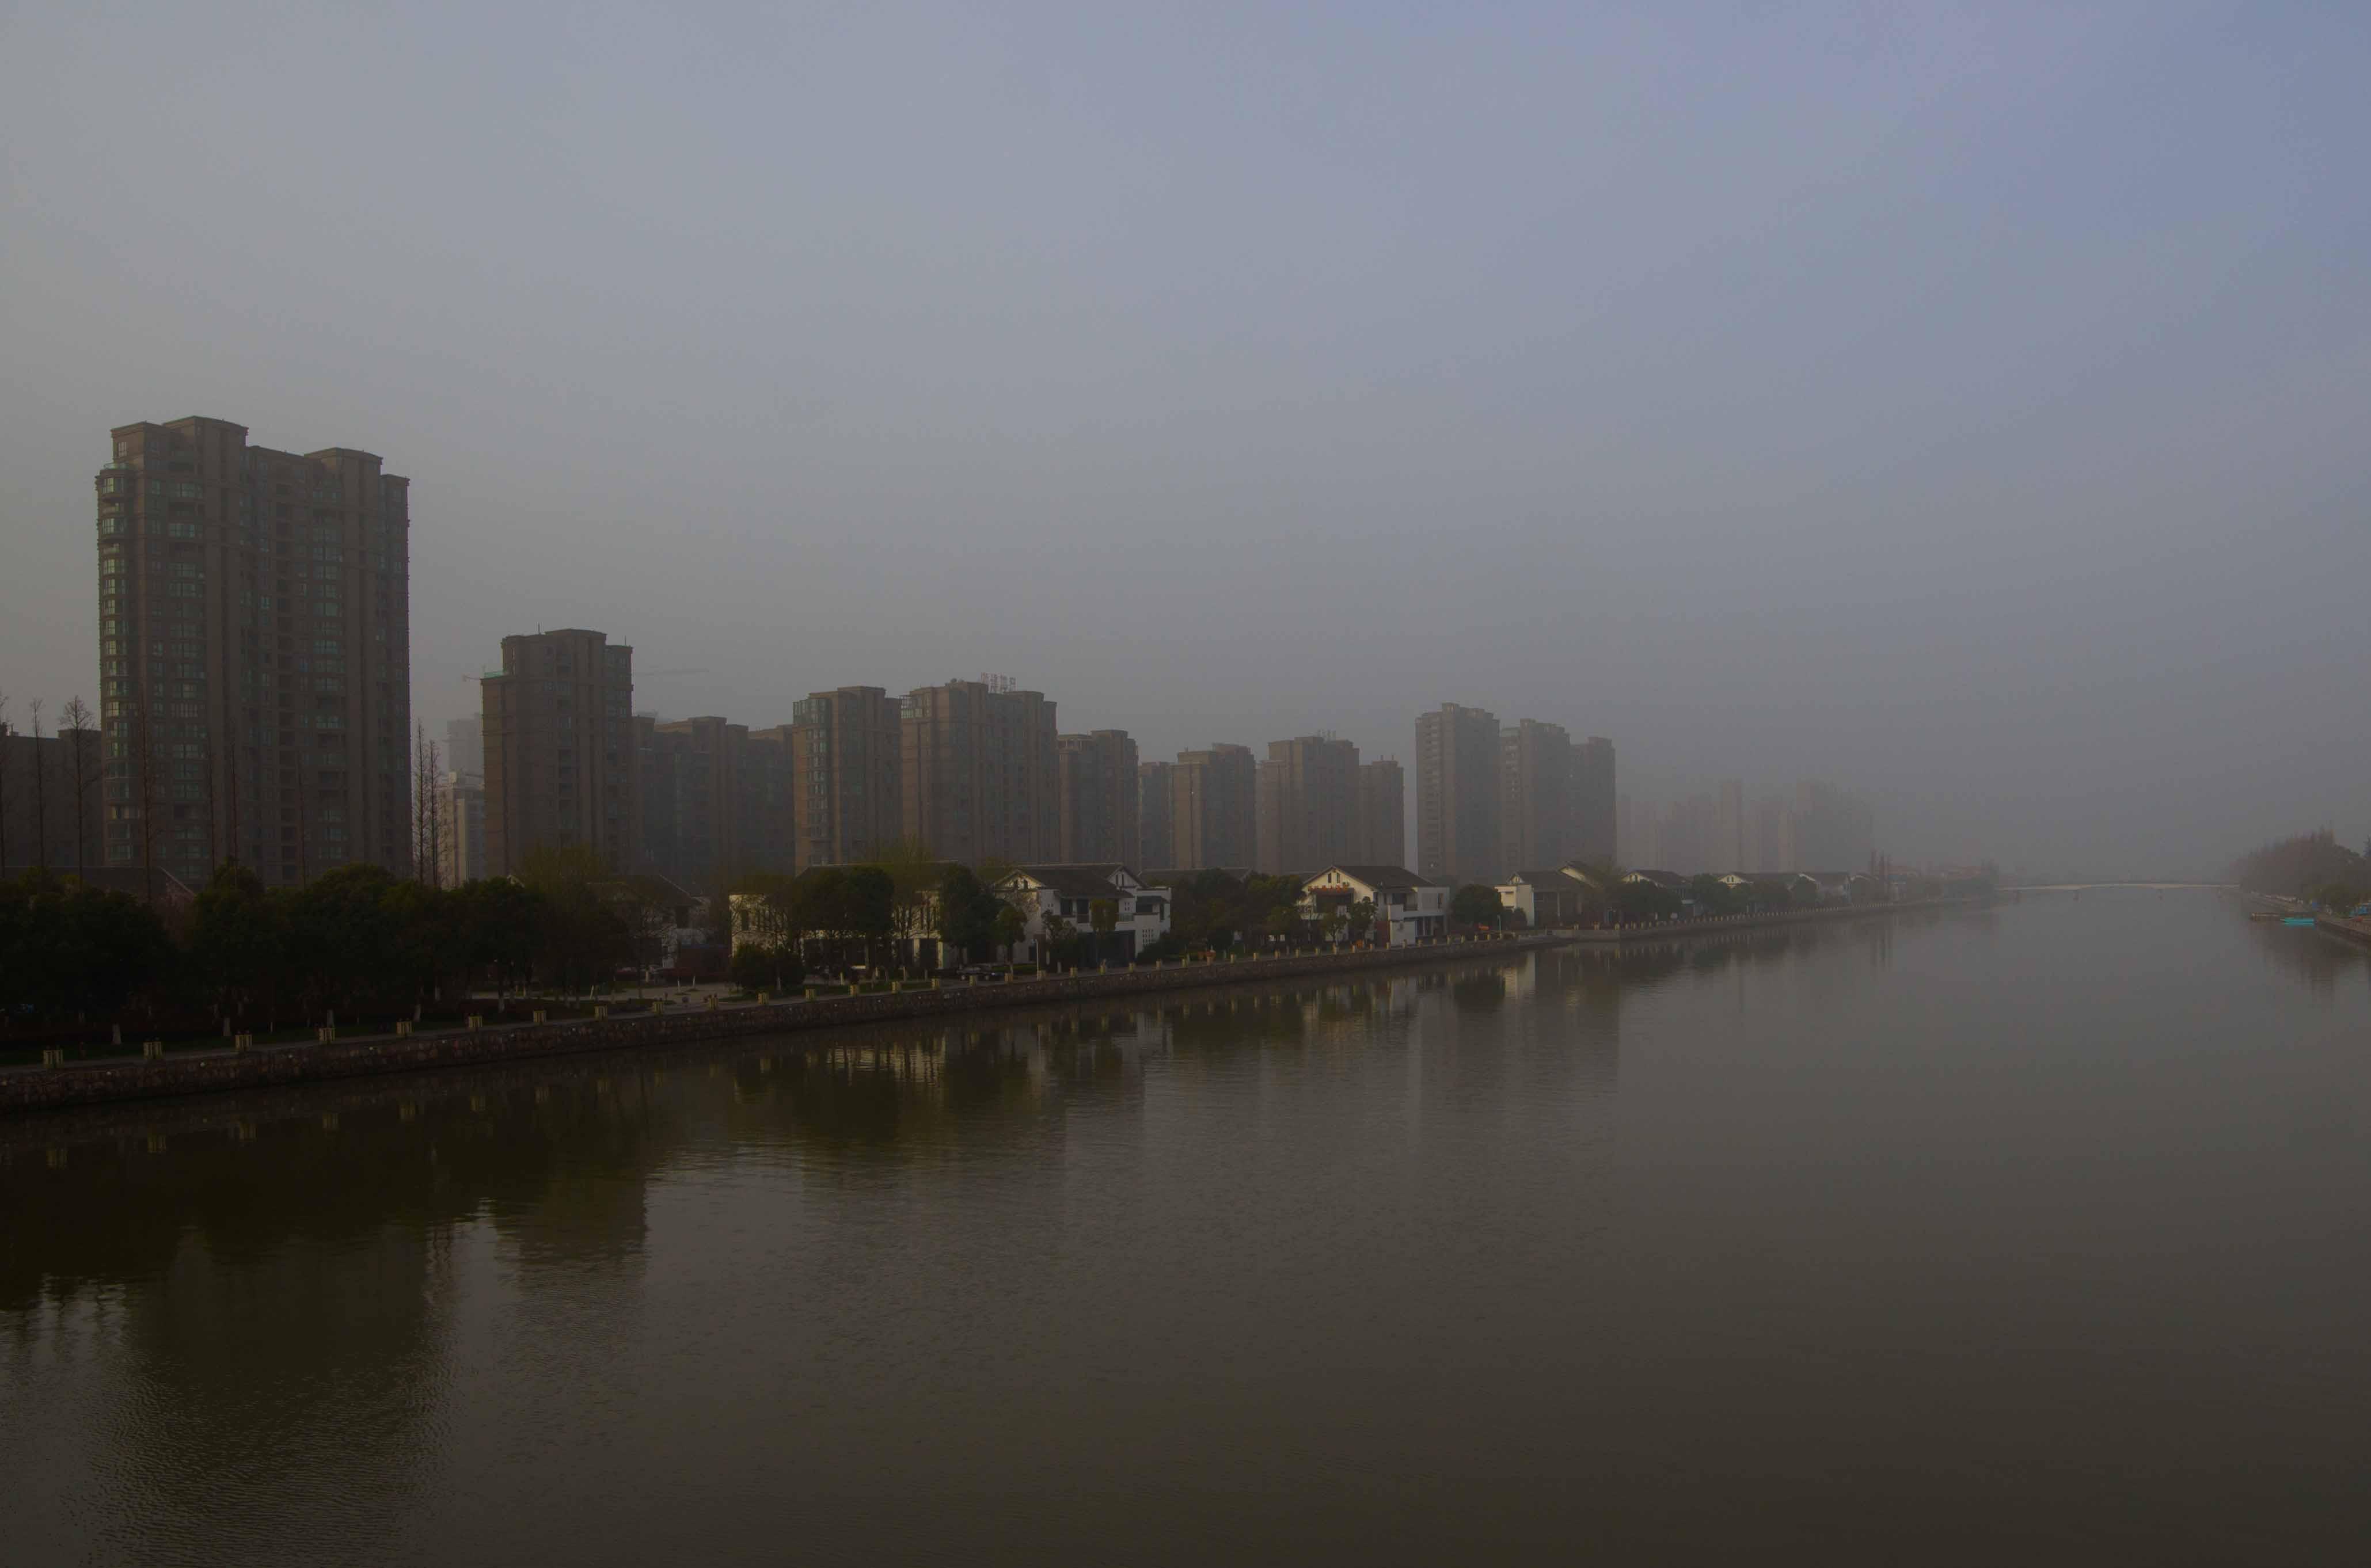 kevin060作品:太仓新浏河